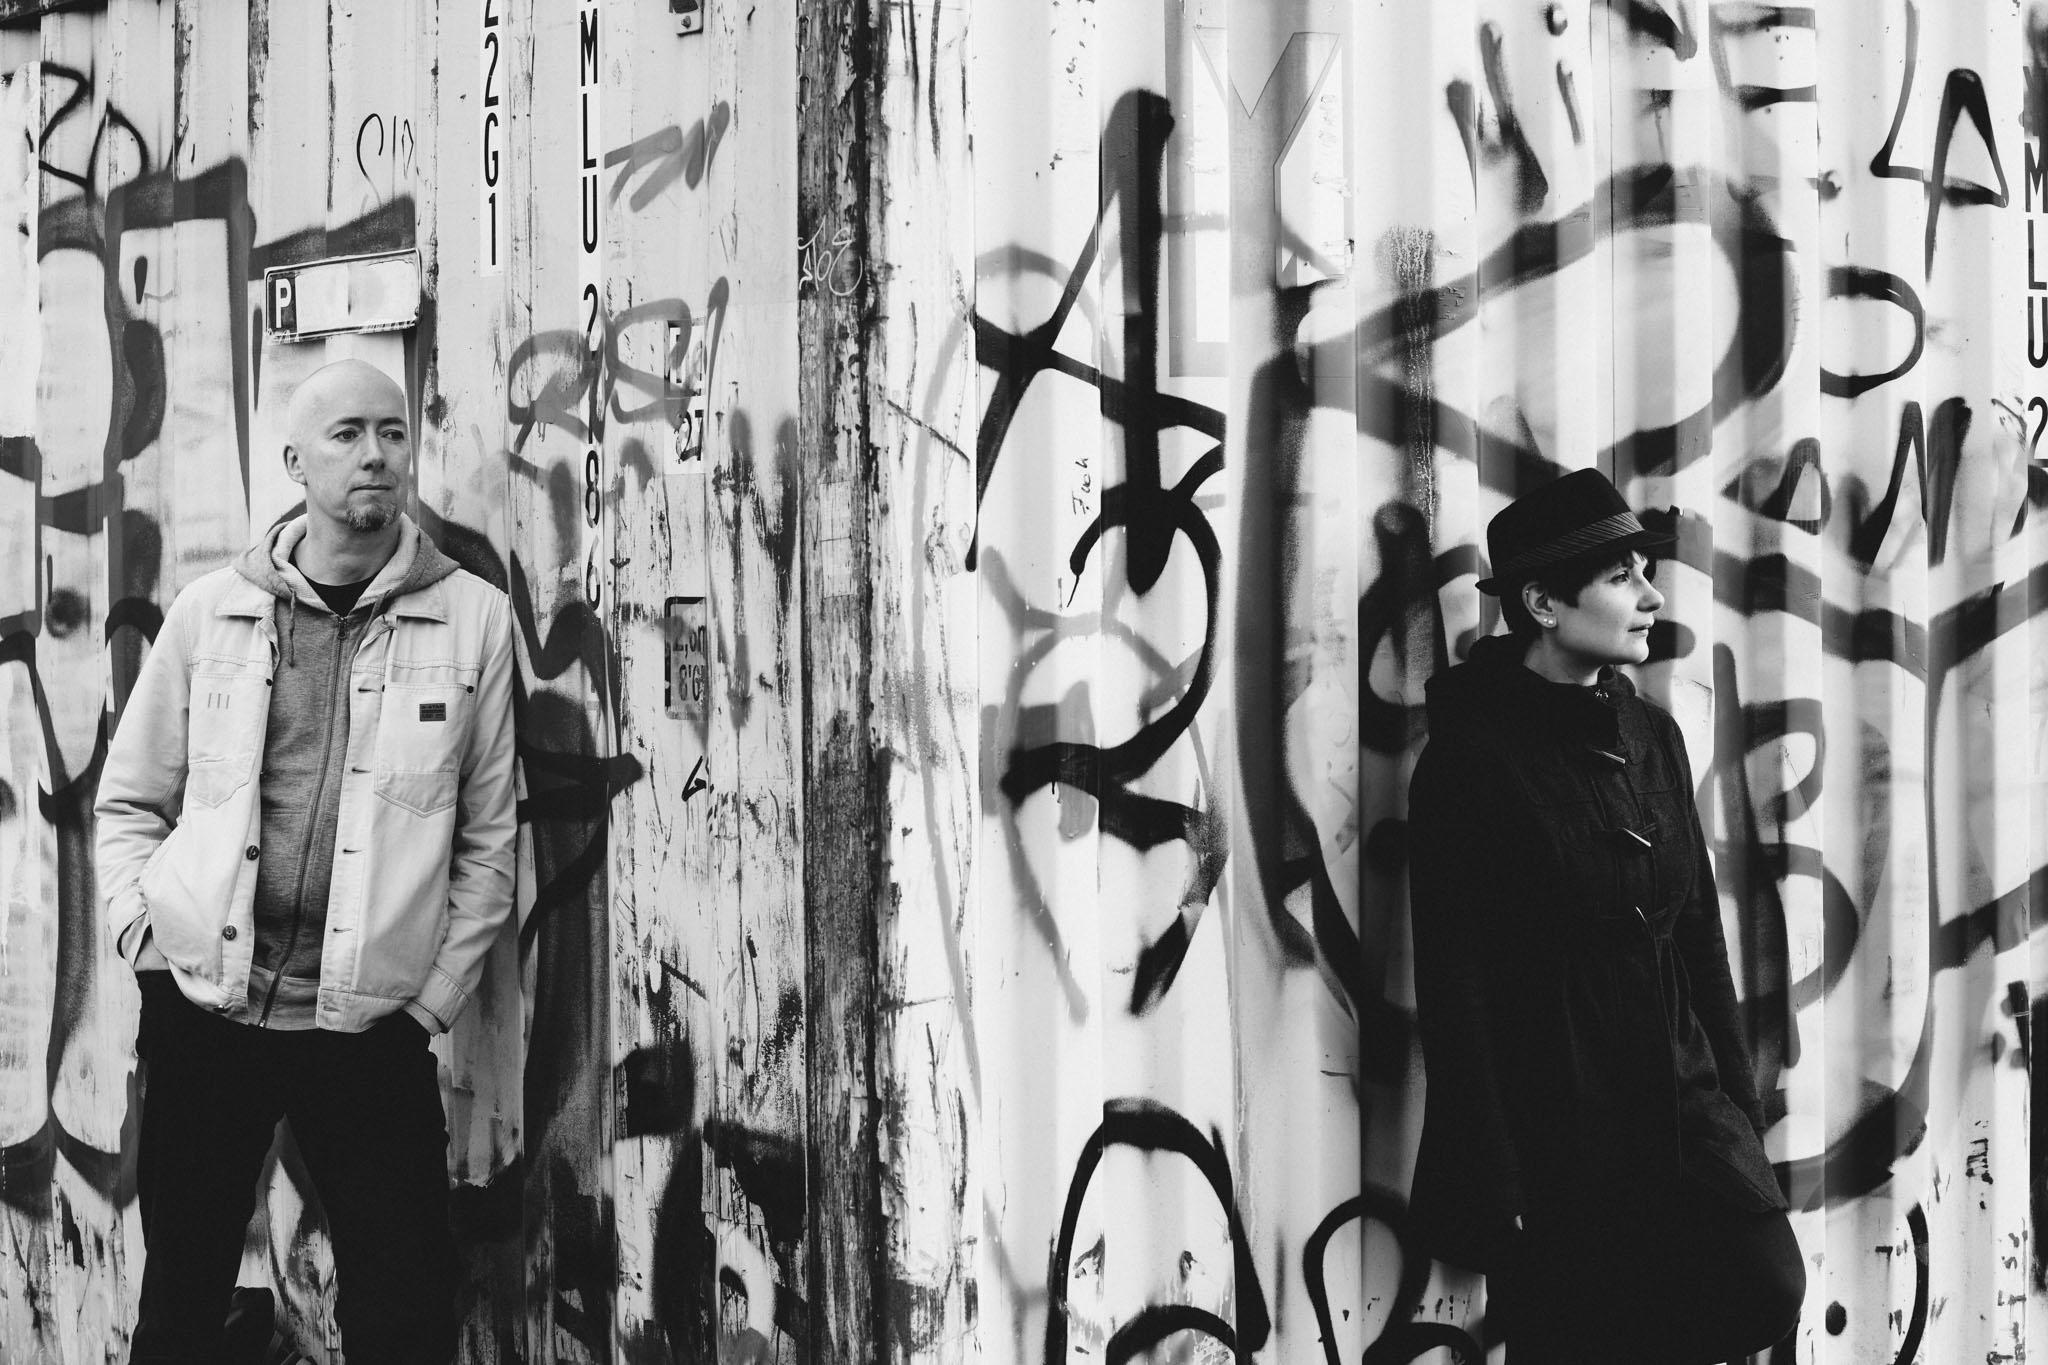 graffiti-foto-paarshooting-berlin-schwarzweiss